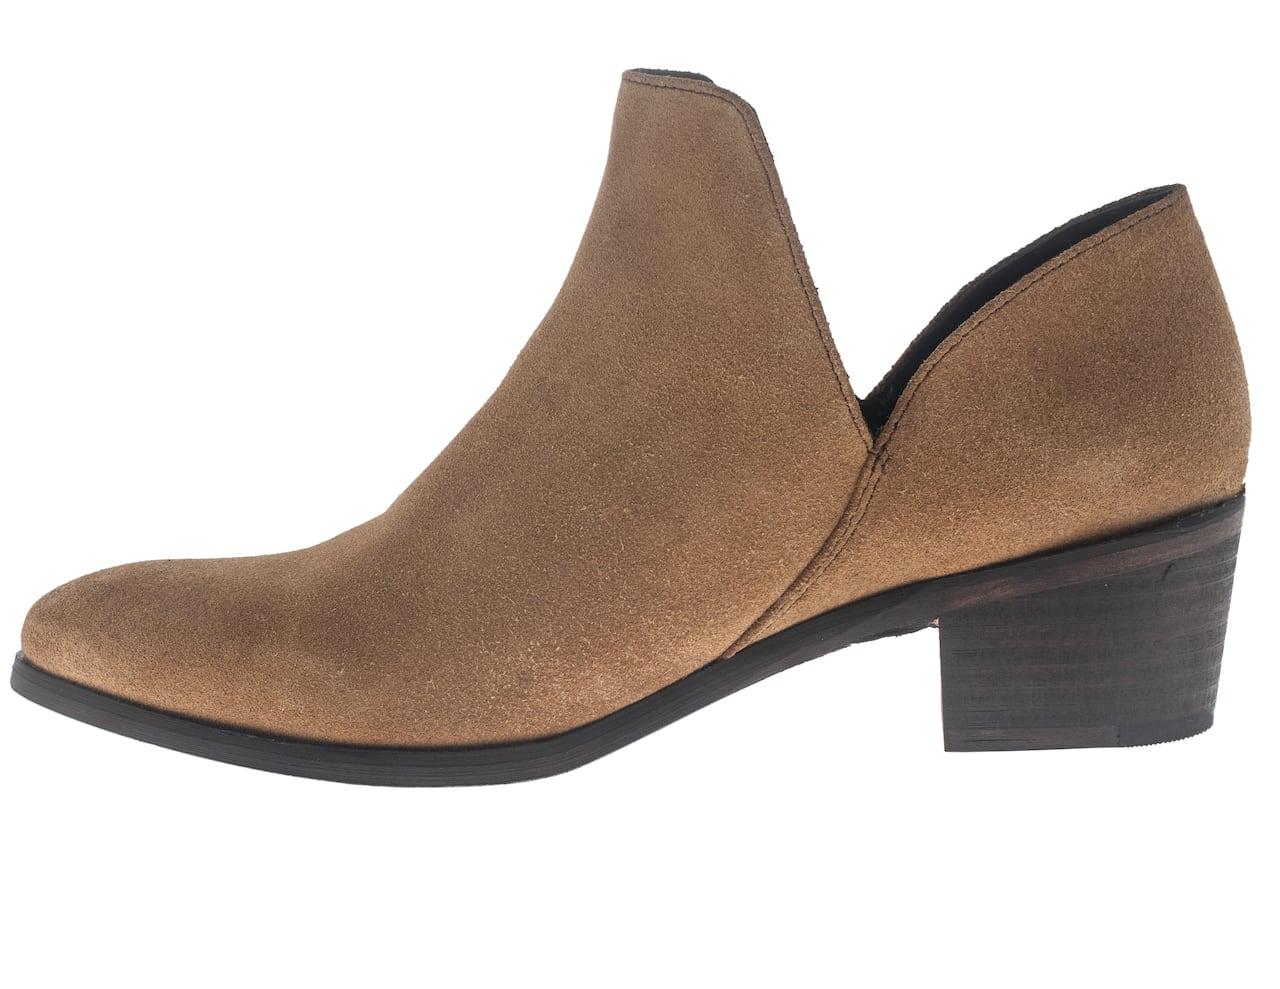 P.E.I. man making his mark in shoe